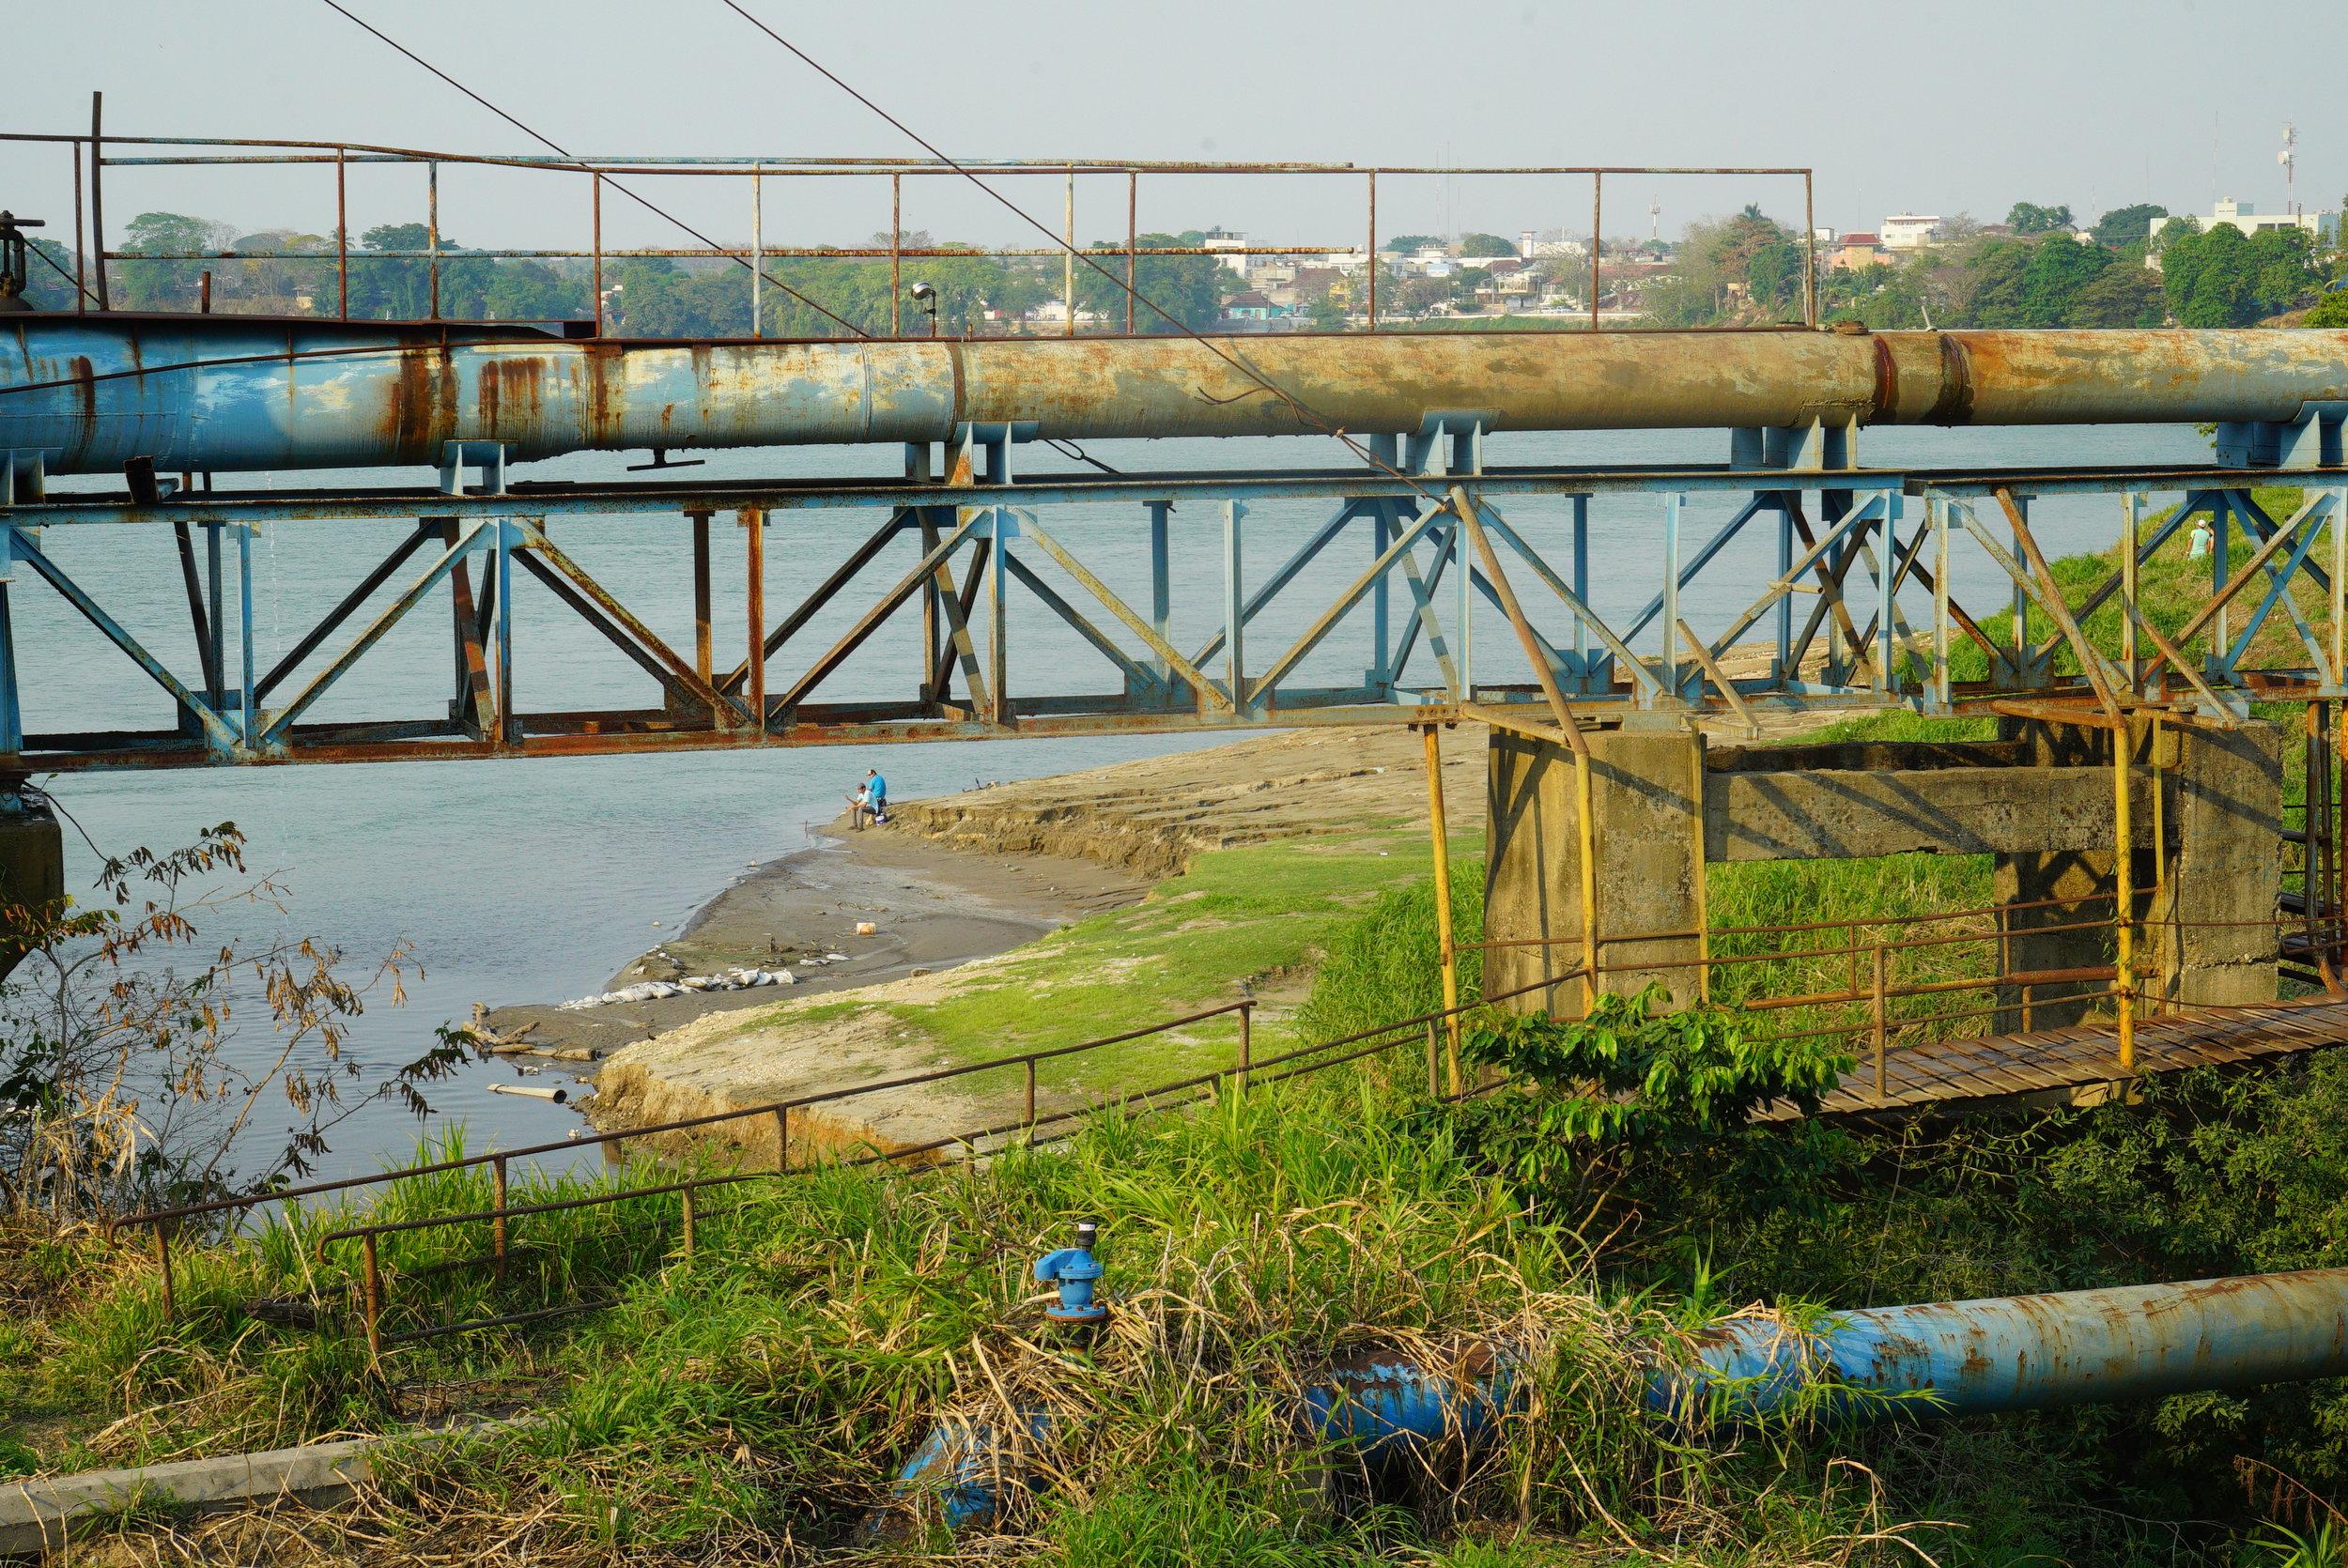 Close to the water treatment pipes, where migrants bathe in Rio Usumascinta, Tenosique, Tabasco. Photo by: Irving Mongradón